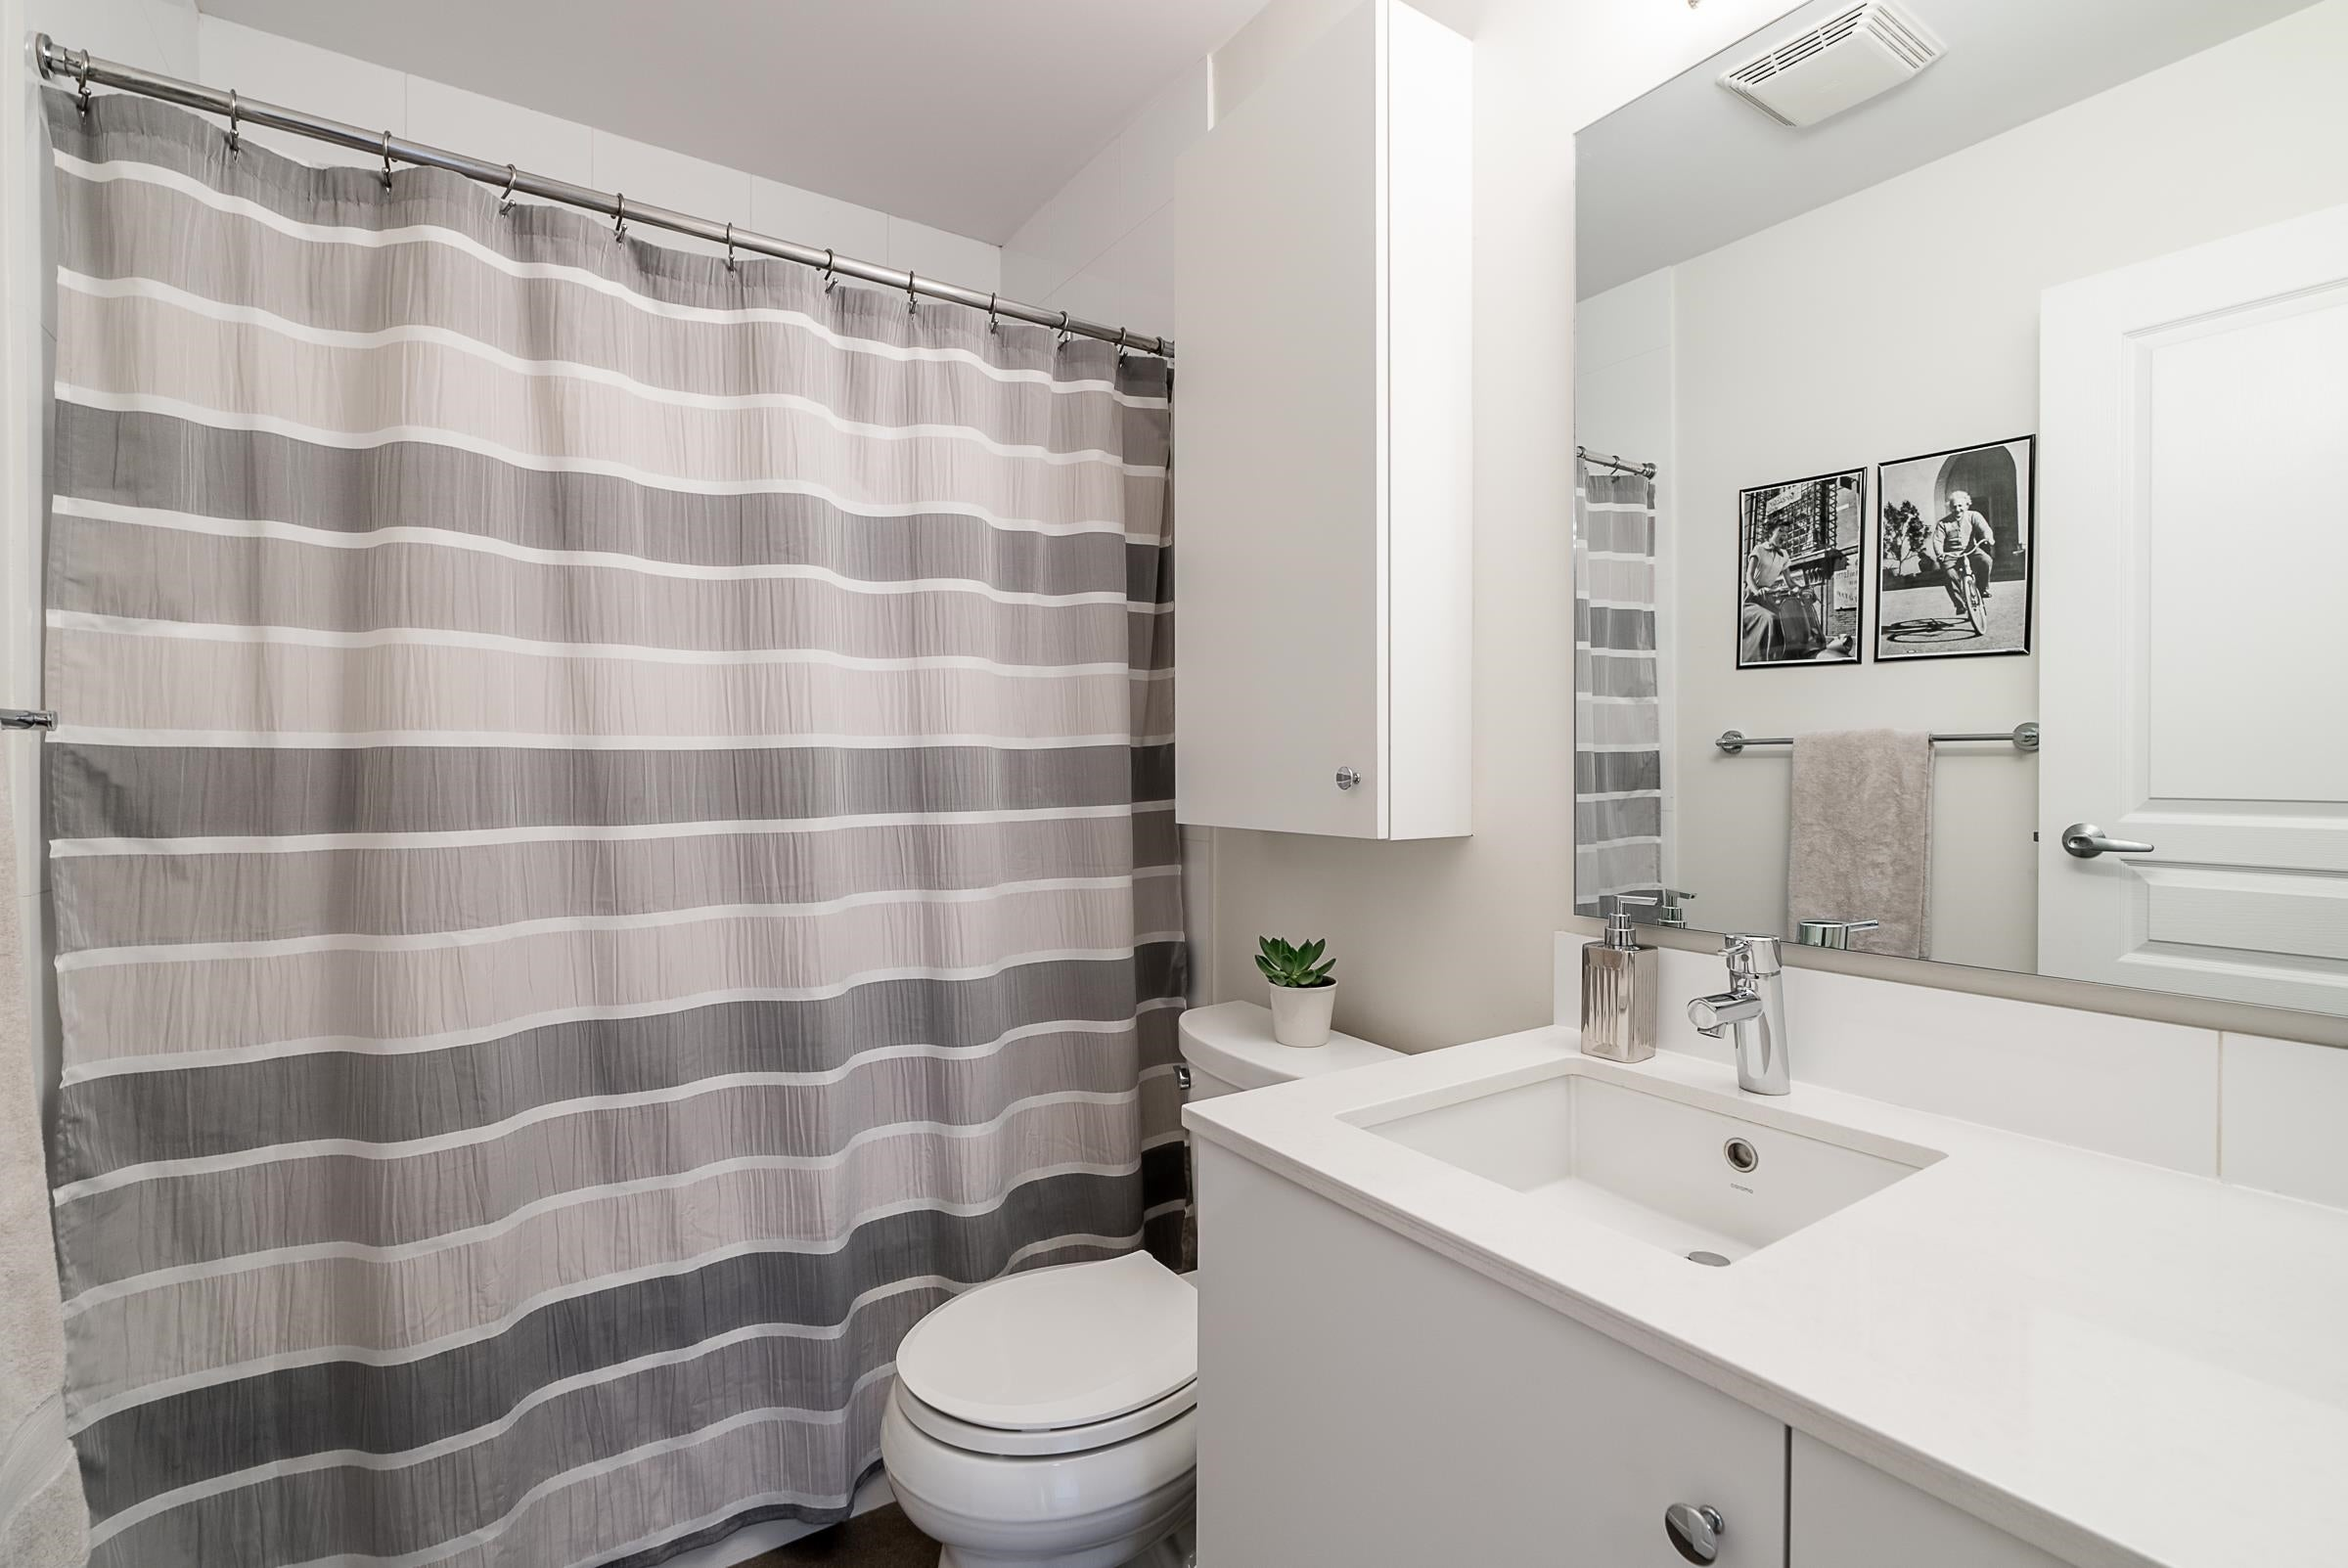 406 1989 DUNBAR STREET - Kitsilano Apartment/Condo for sale, 1 Bedroom (R2624949) - #19